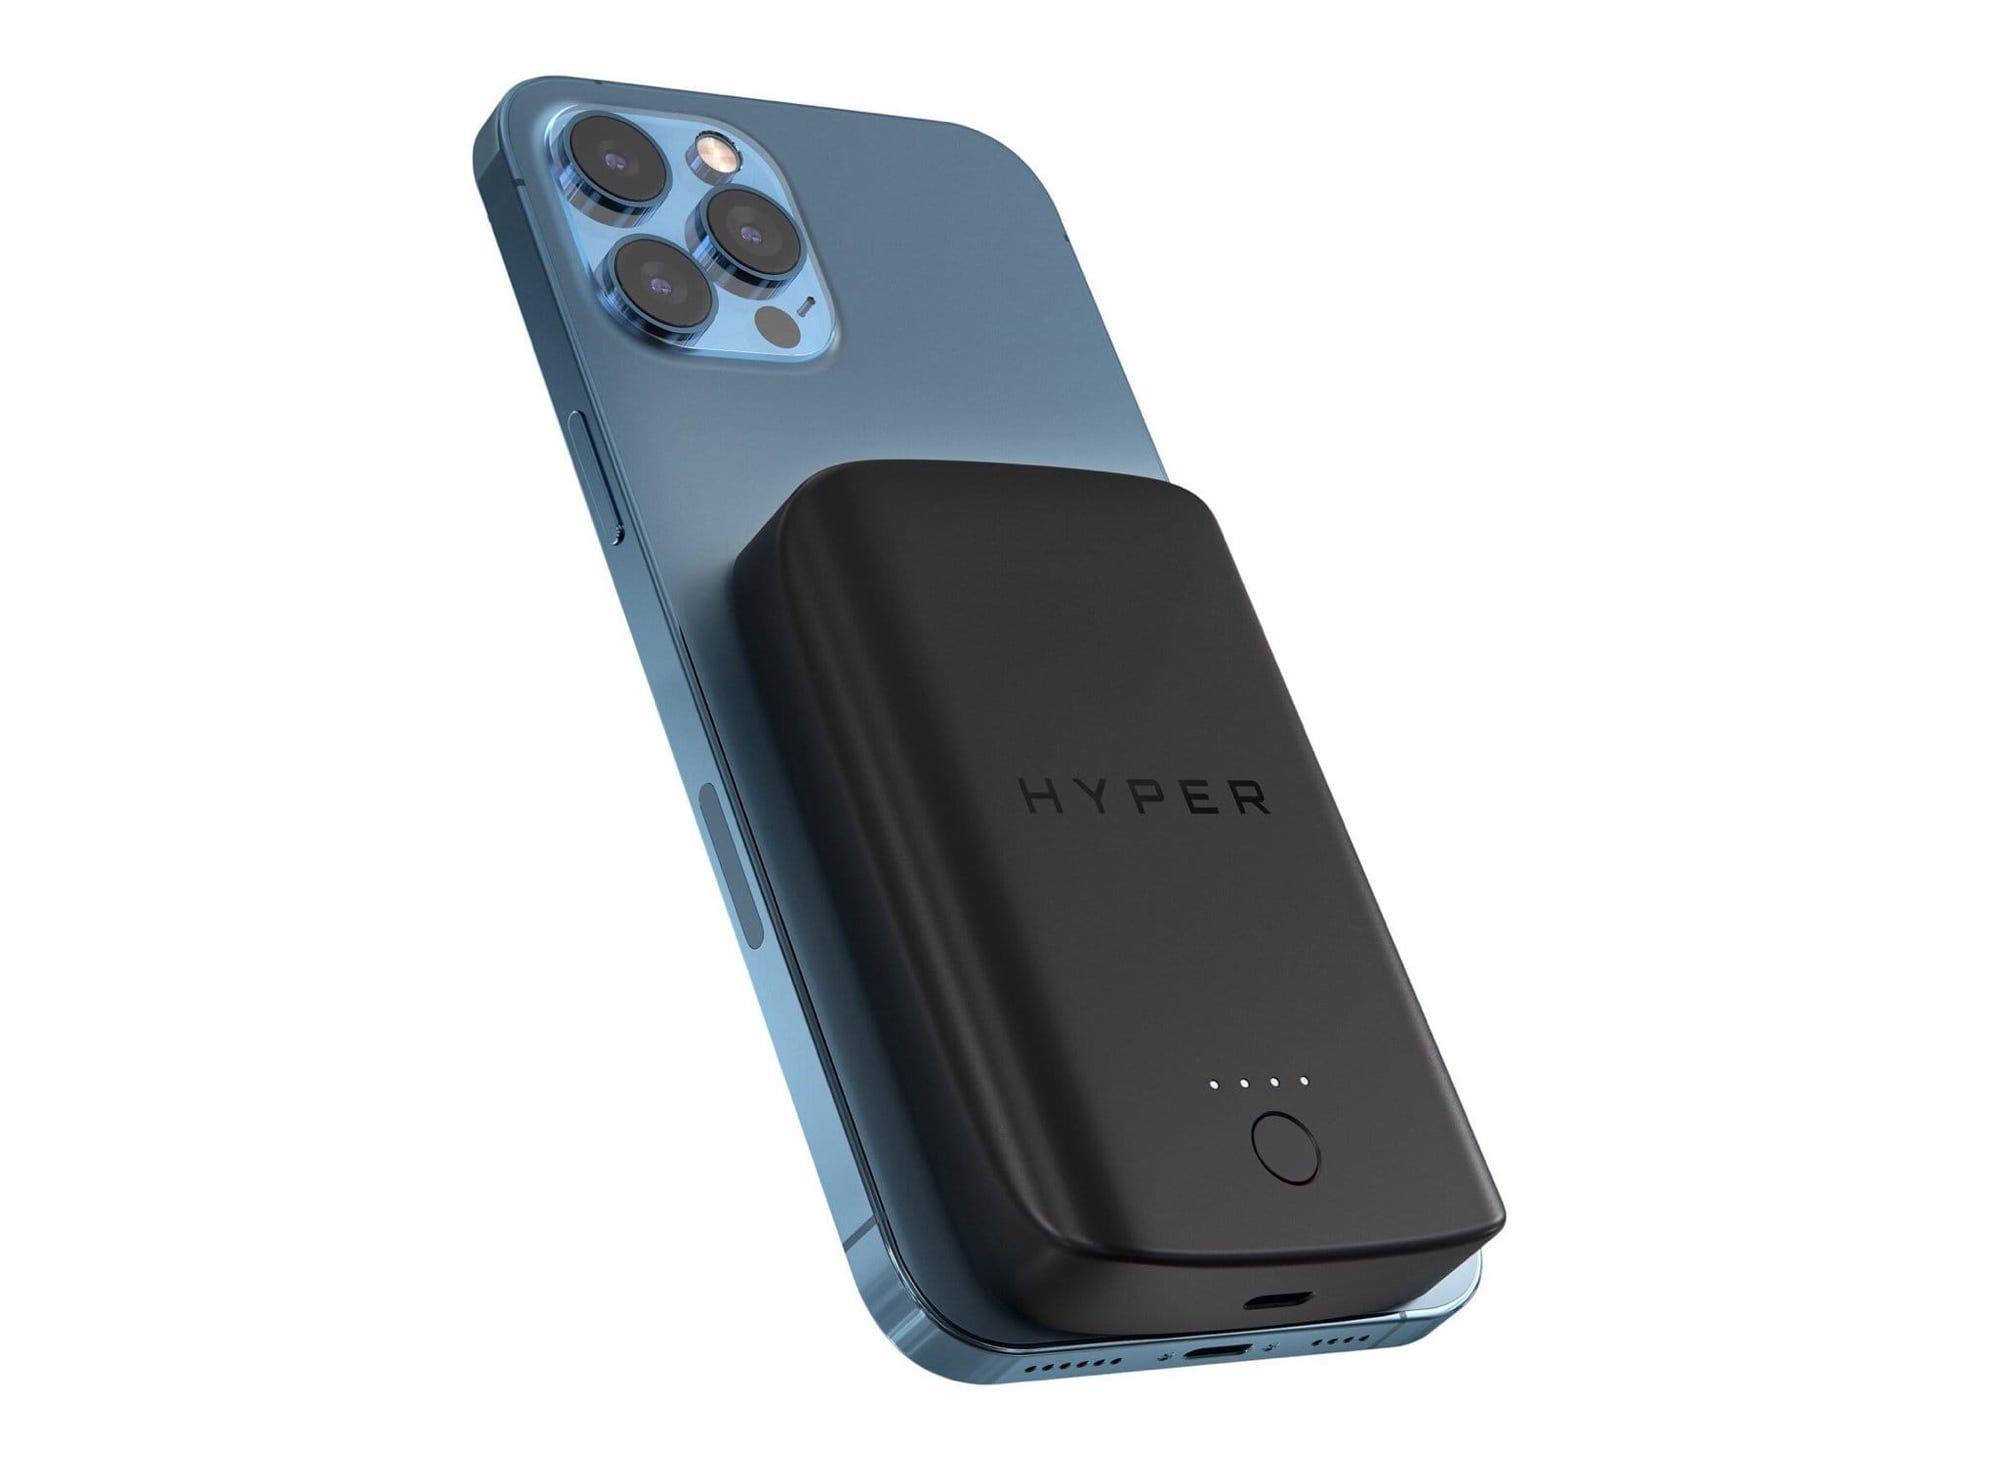 HYPERのMagSafe対応ワイヤレスモバイルバッテリー、一般販売スタート